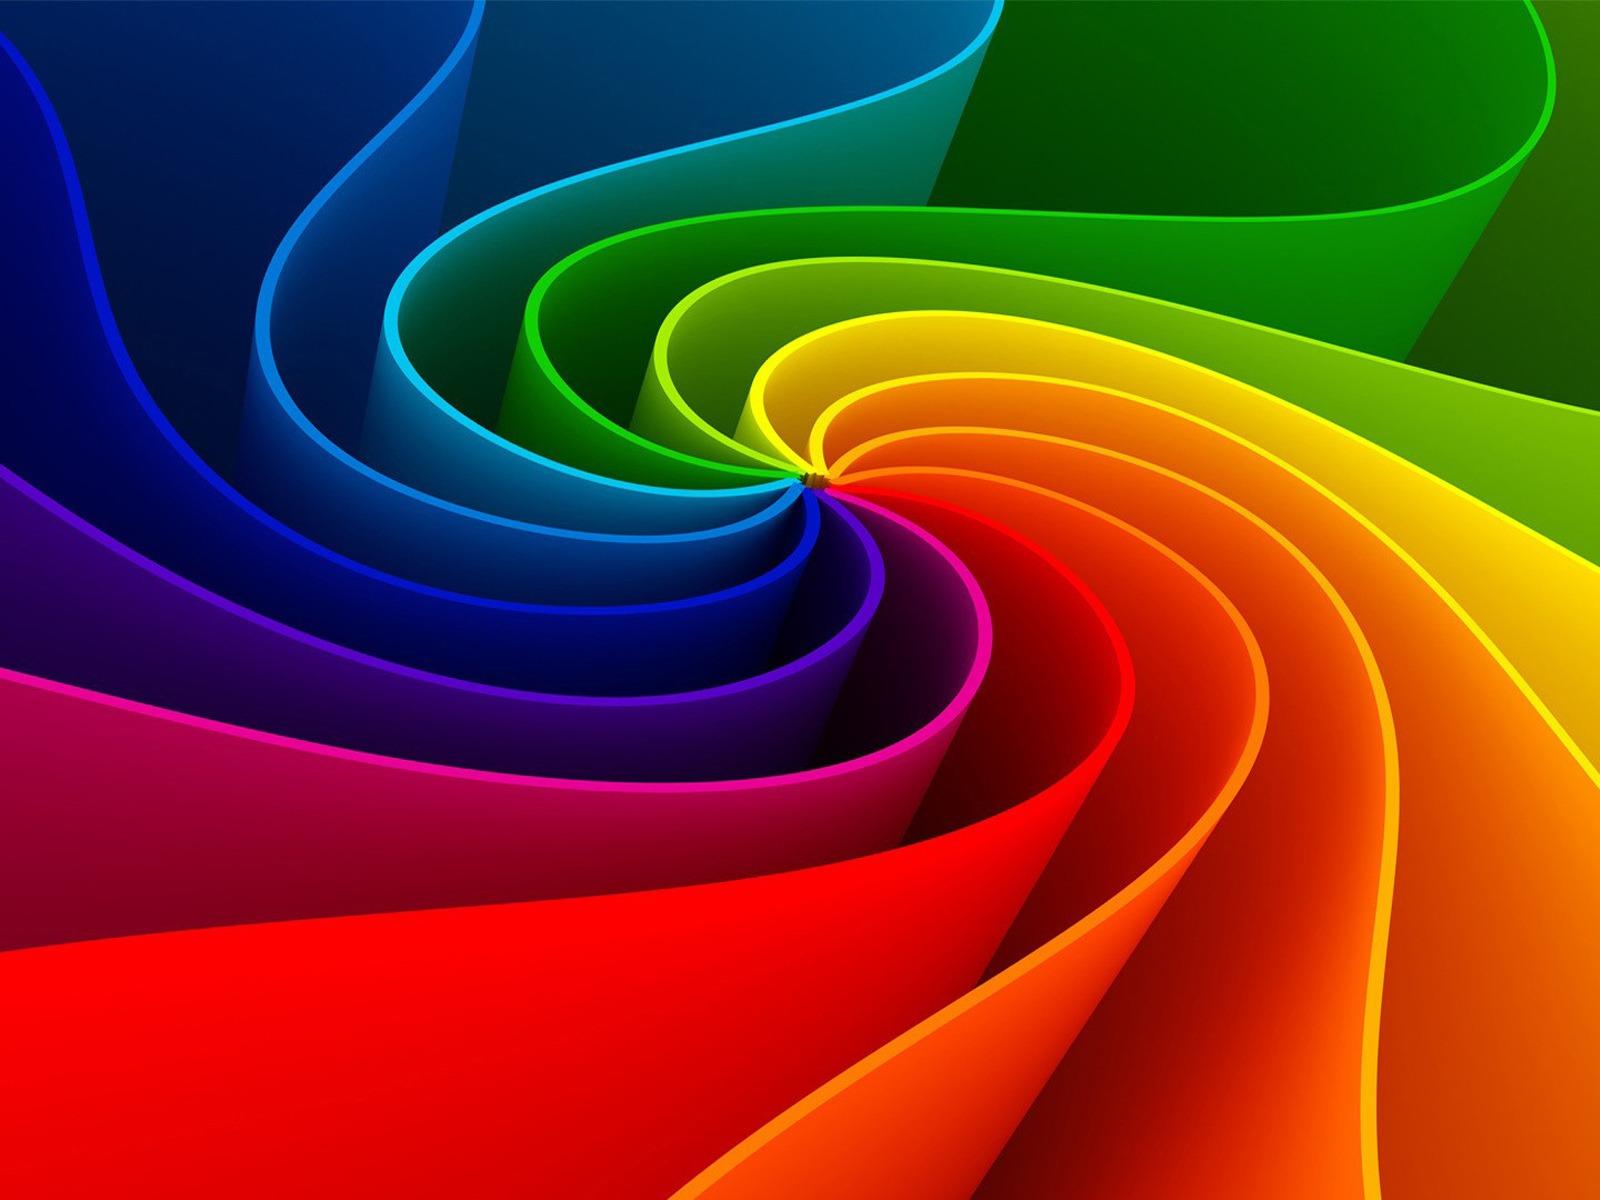 3D Rainbow Wallpaper Live HD Wallpaper HQ Pictures Images Photos 1600x1200